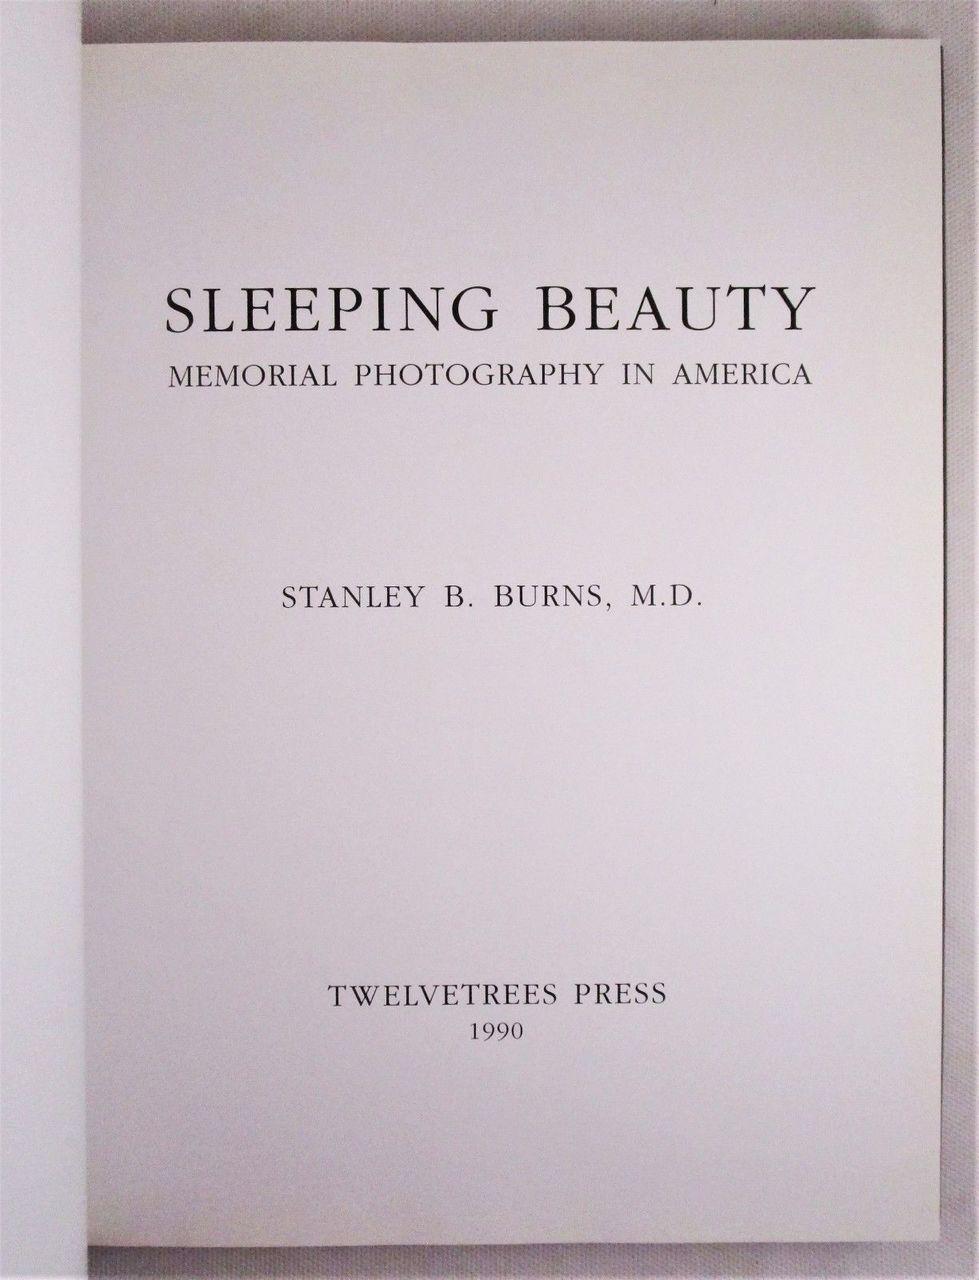 SLEEPING BEAUTY: MEMORIAL PHOTOGRAPHY IN AMERICA, S. Burns 1990 [Ltd Ed] Funeral